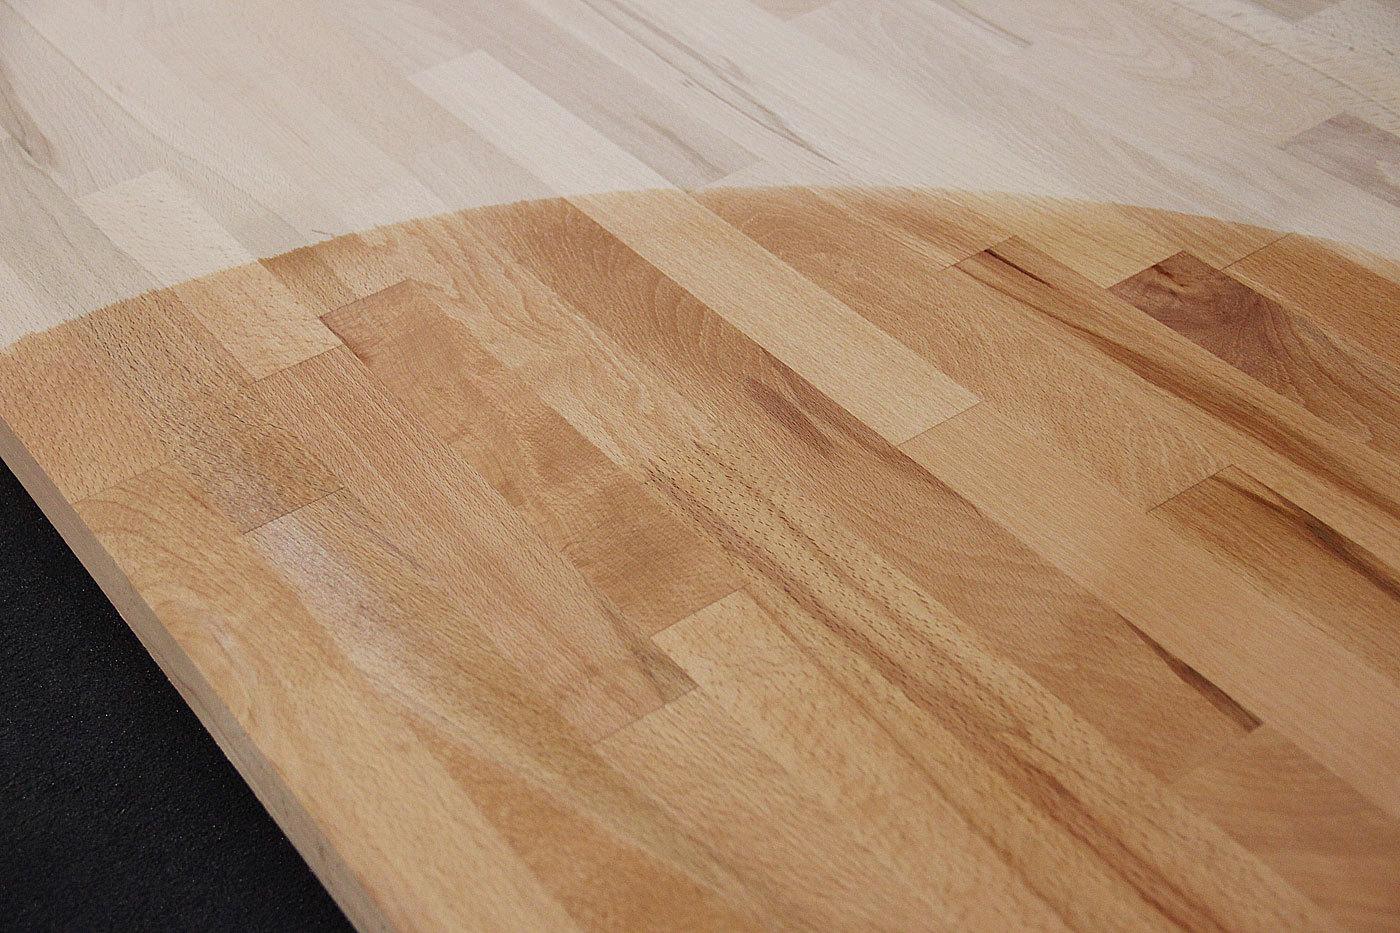 Tischplatte Massivholz Kernbuche Kgz Fsc 174 40 X Diverse